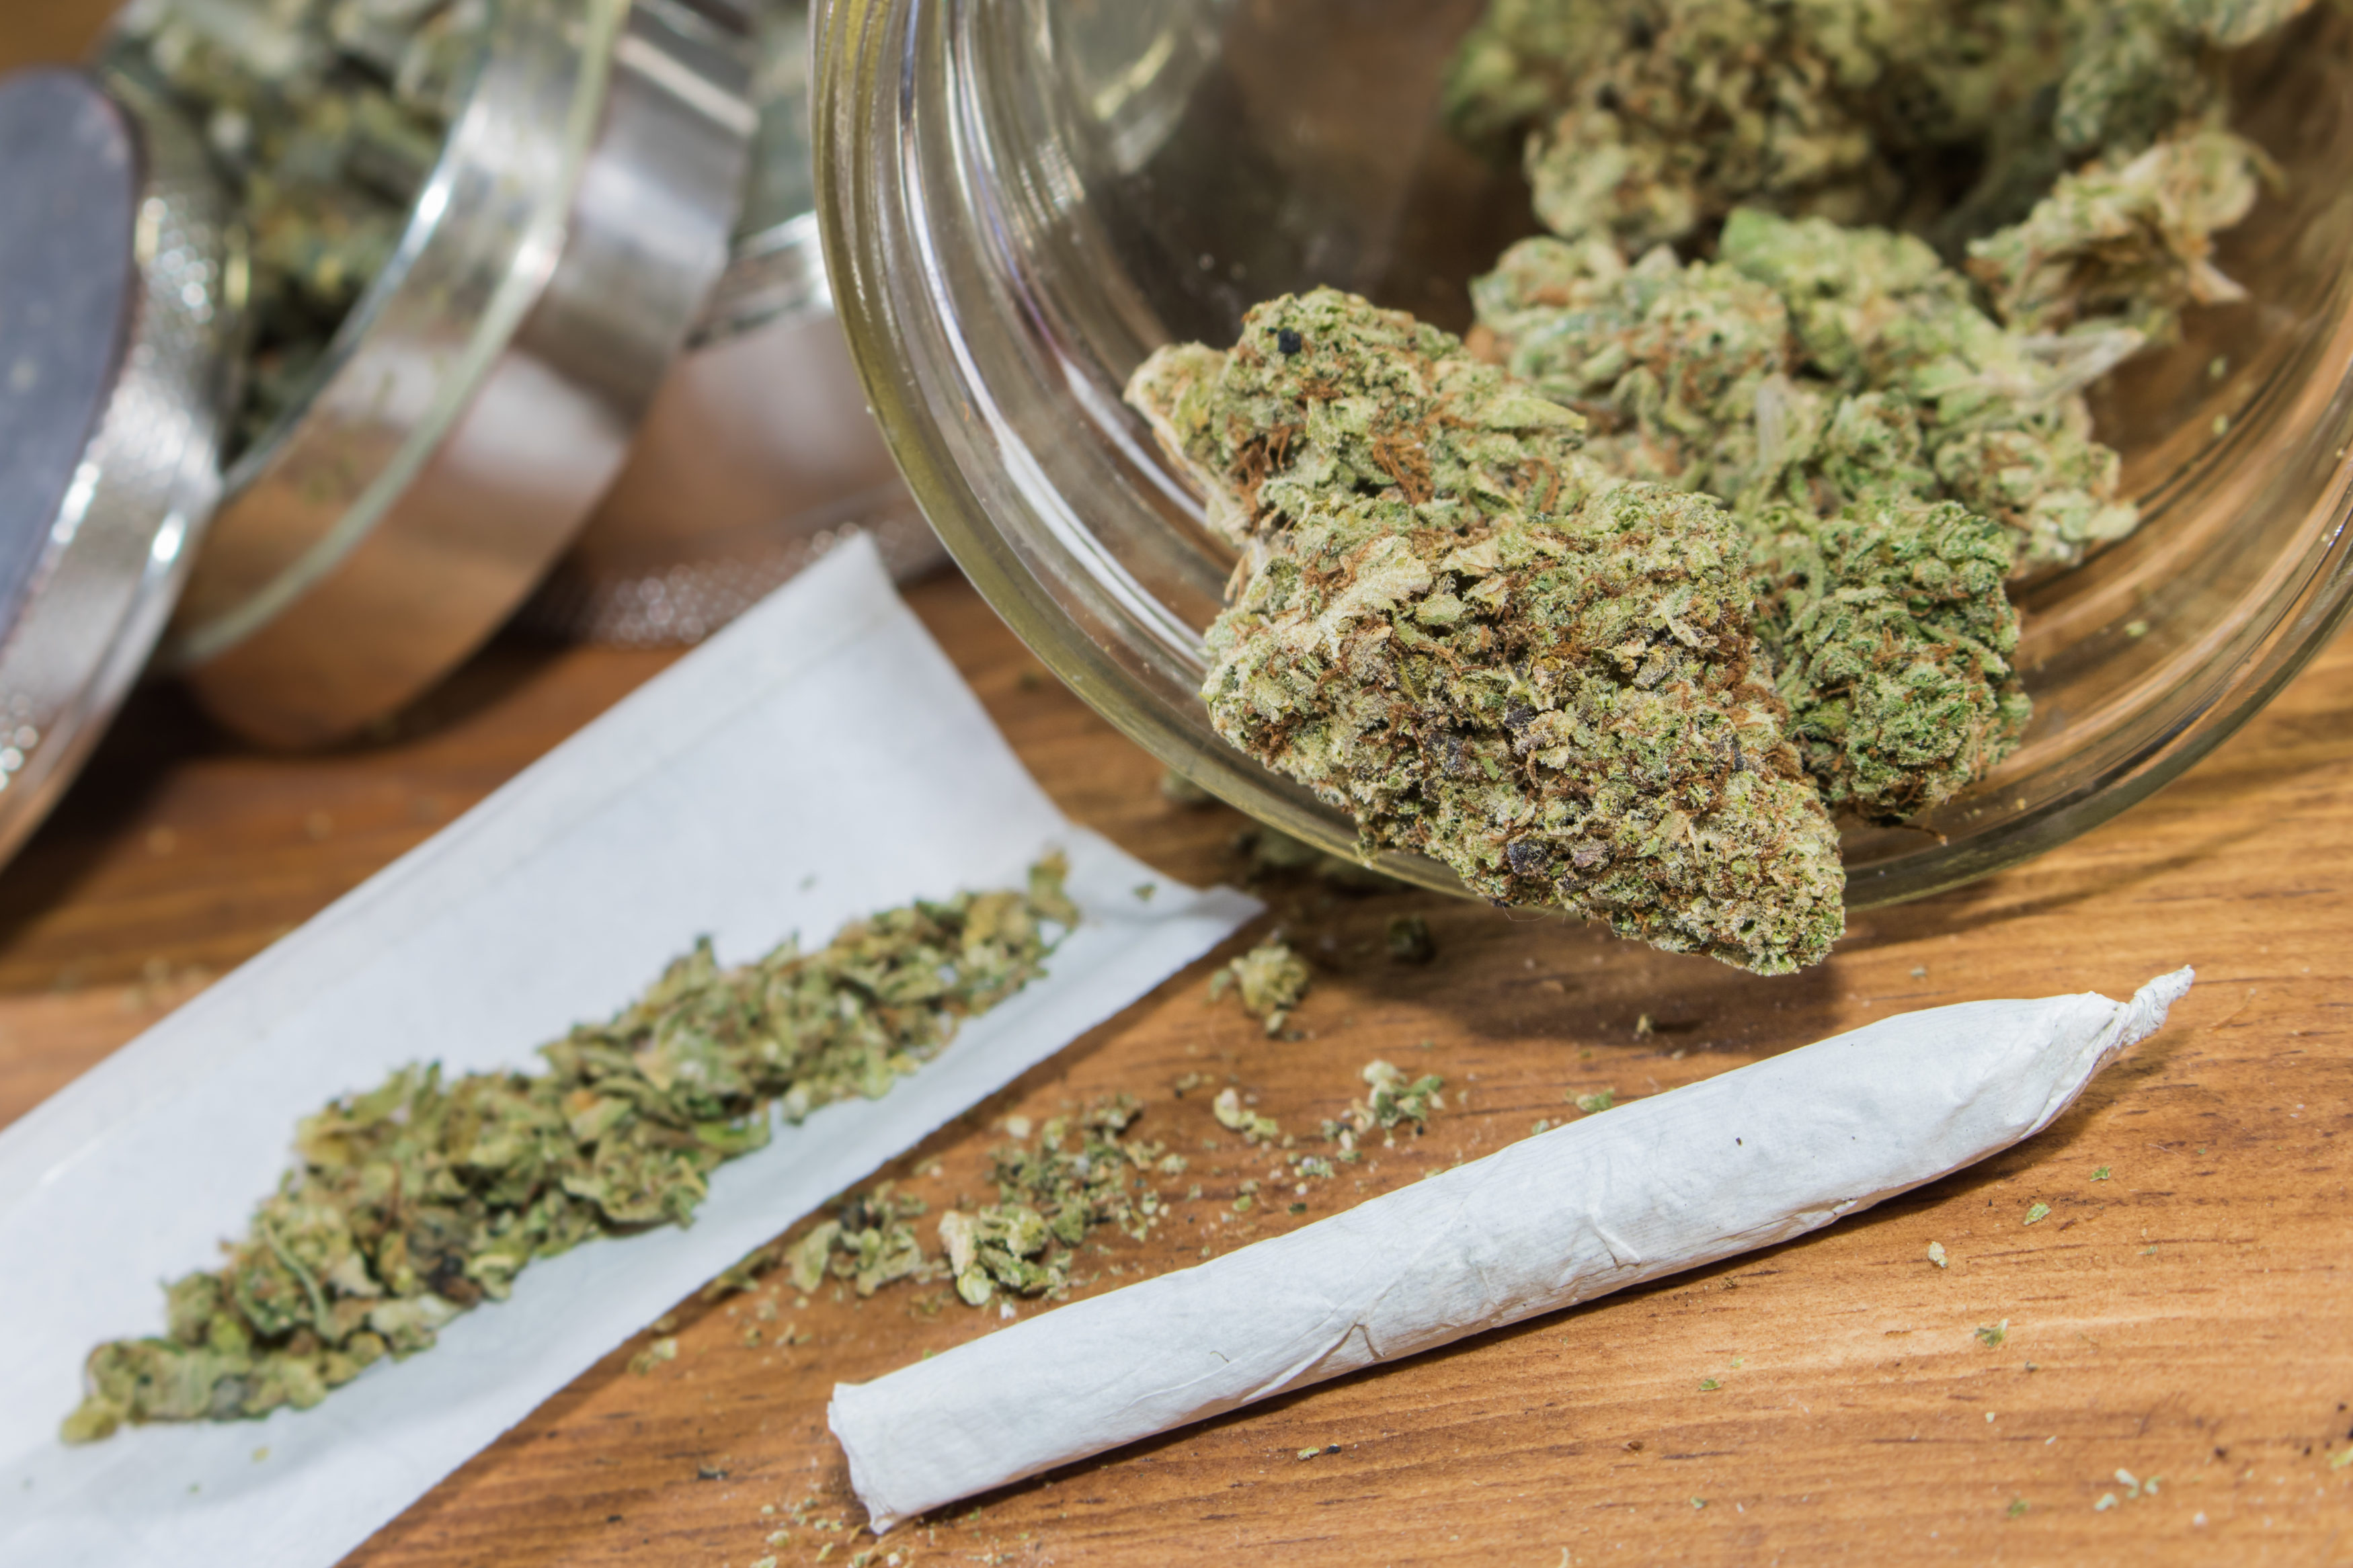 marijuana-cigarette-3500x2333.jpg